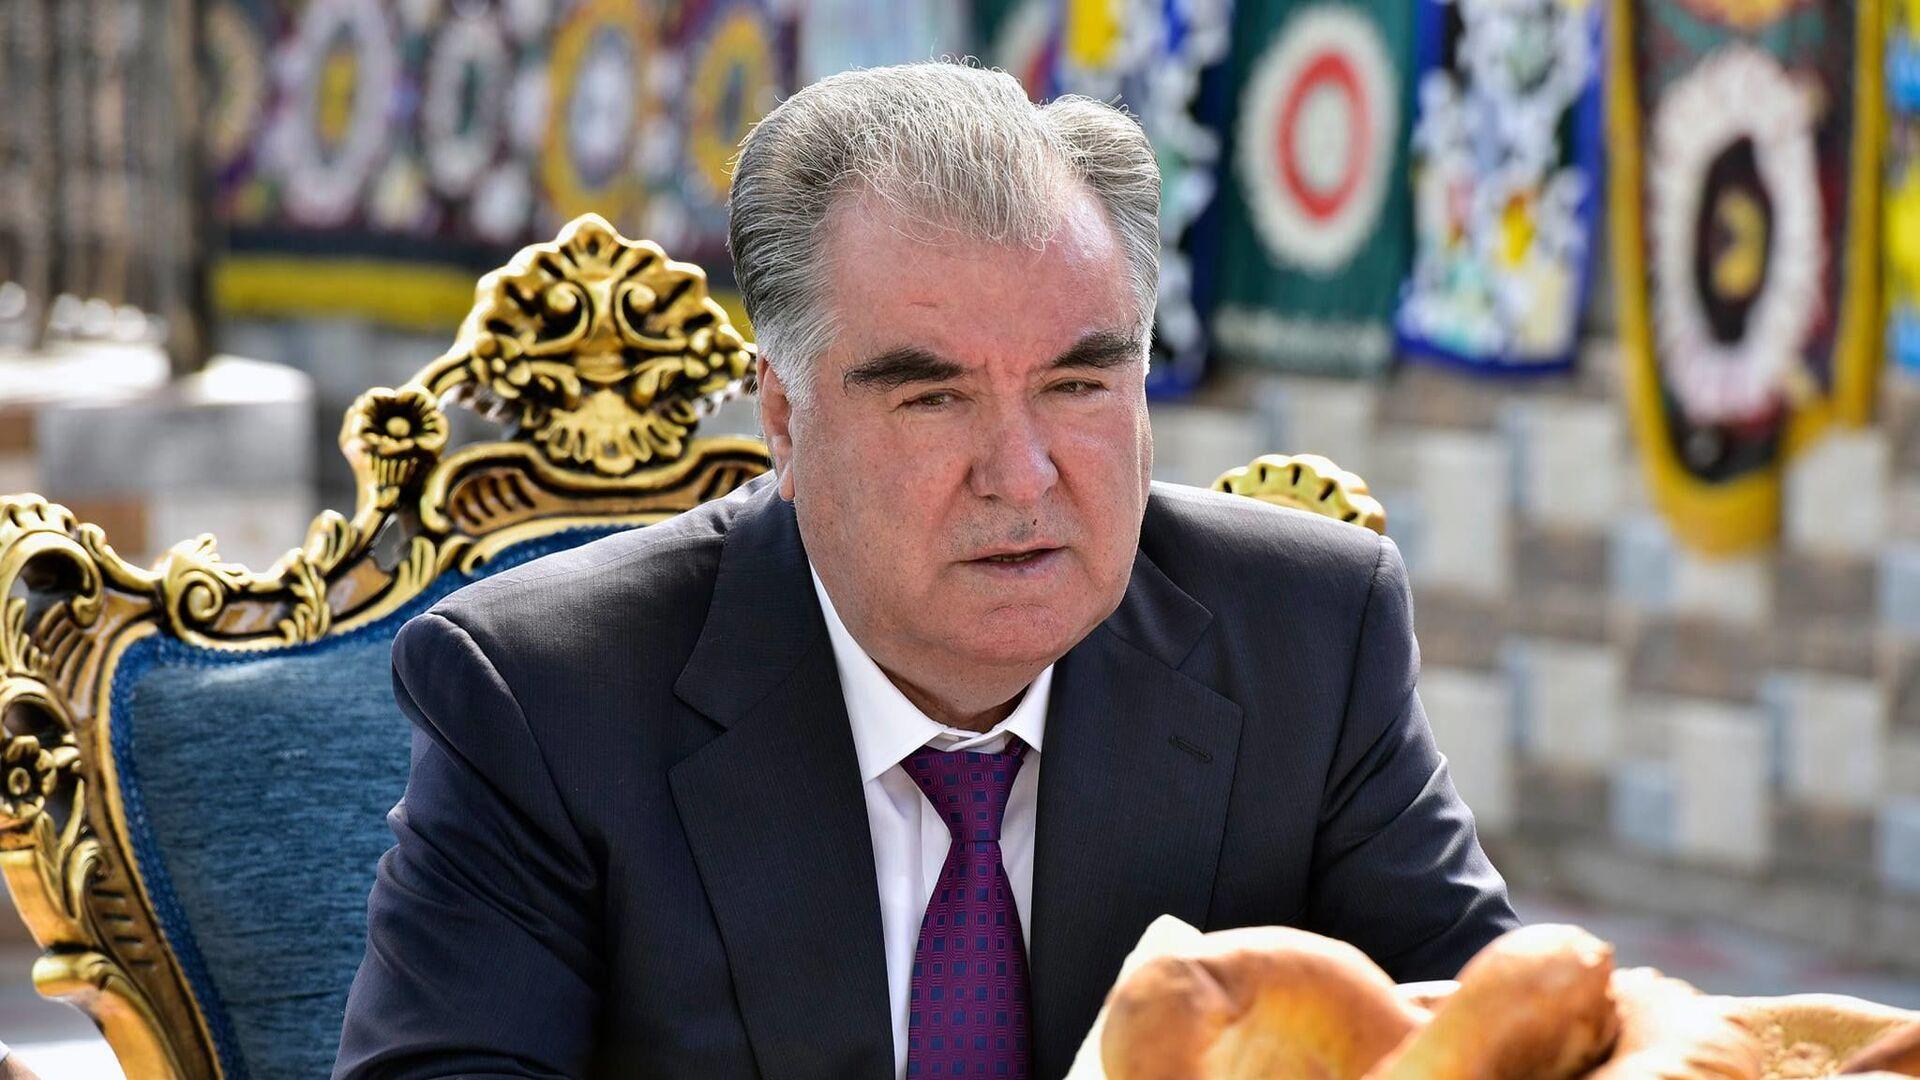 Президент Республики Таджикистан Эмомали Рахмон - Sputnik Тоҷикистон, 1920, 25.07.2021